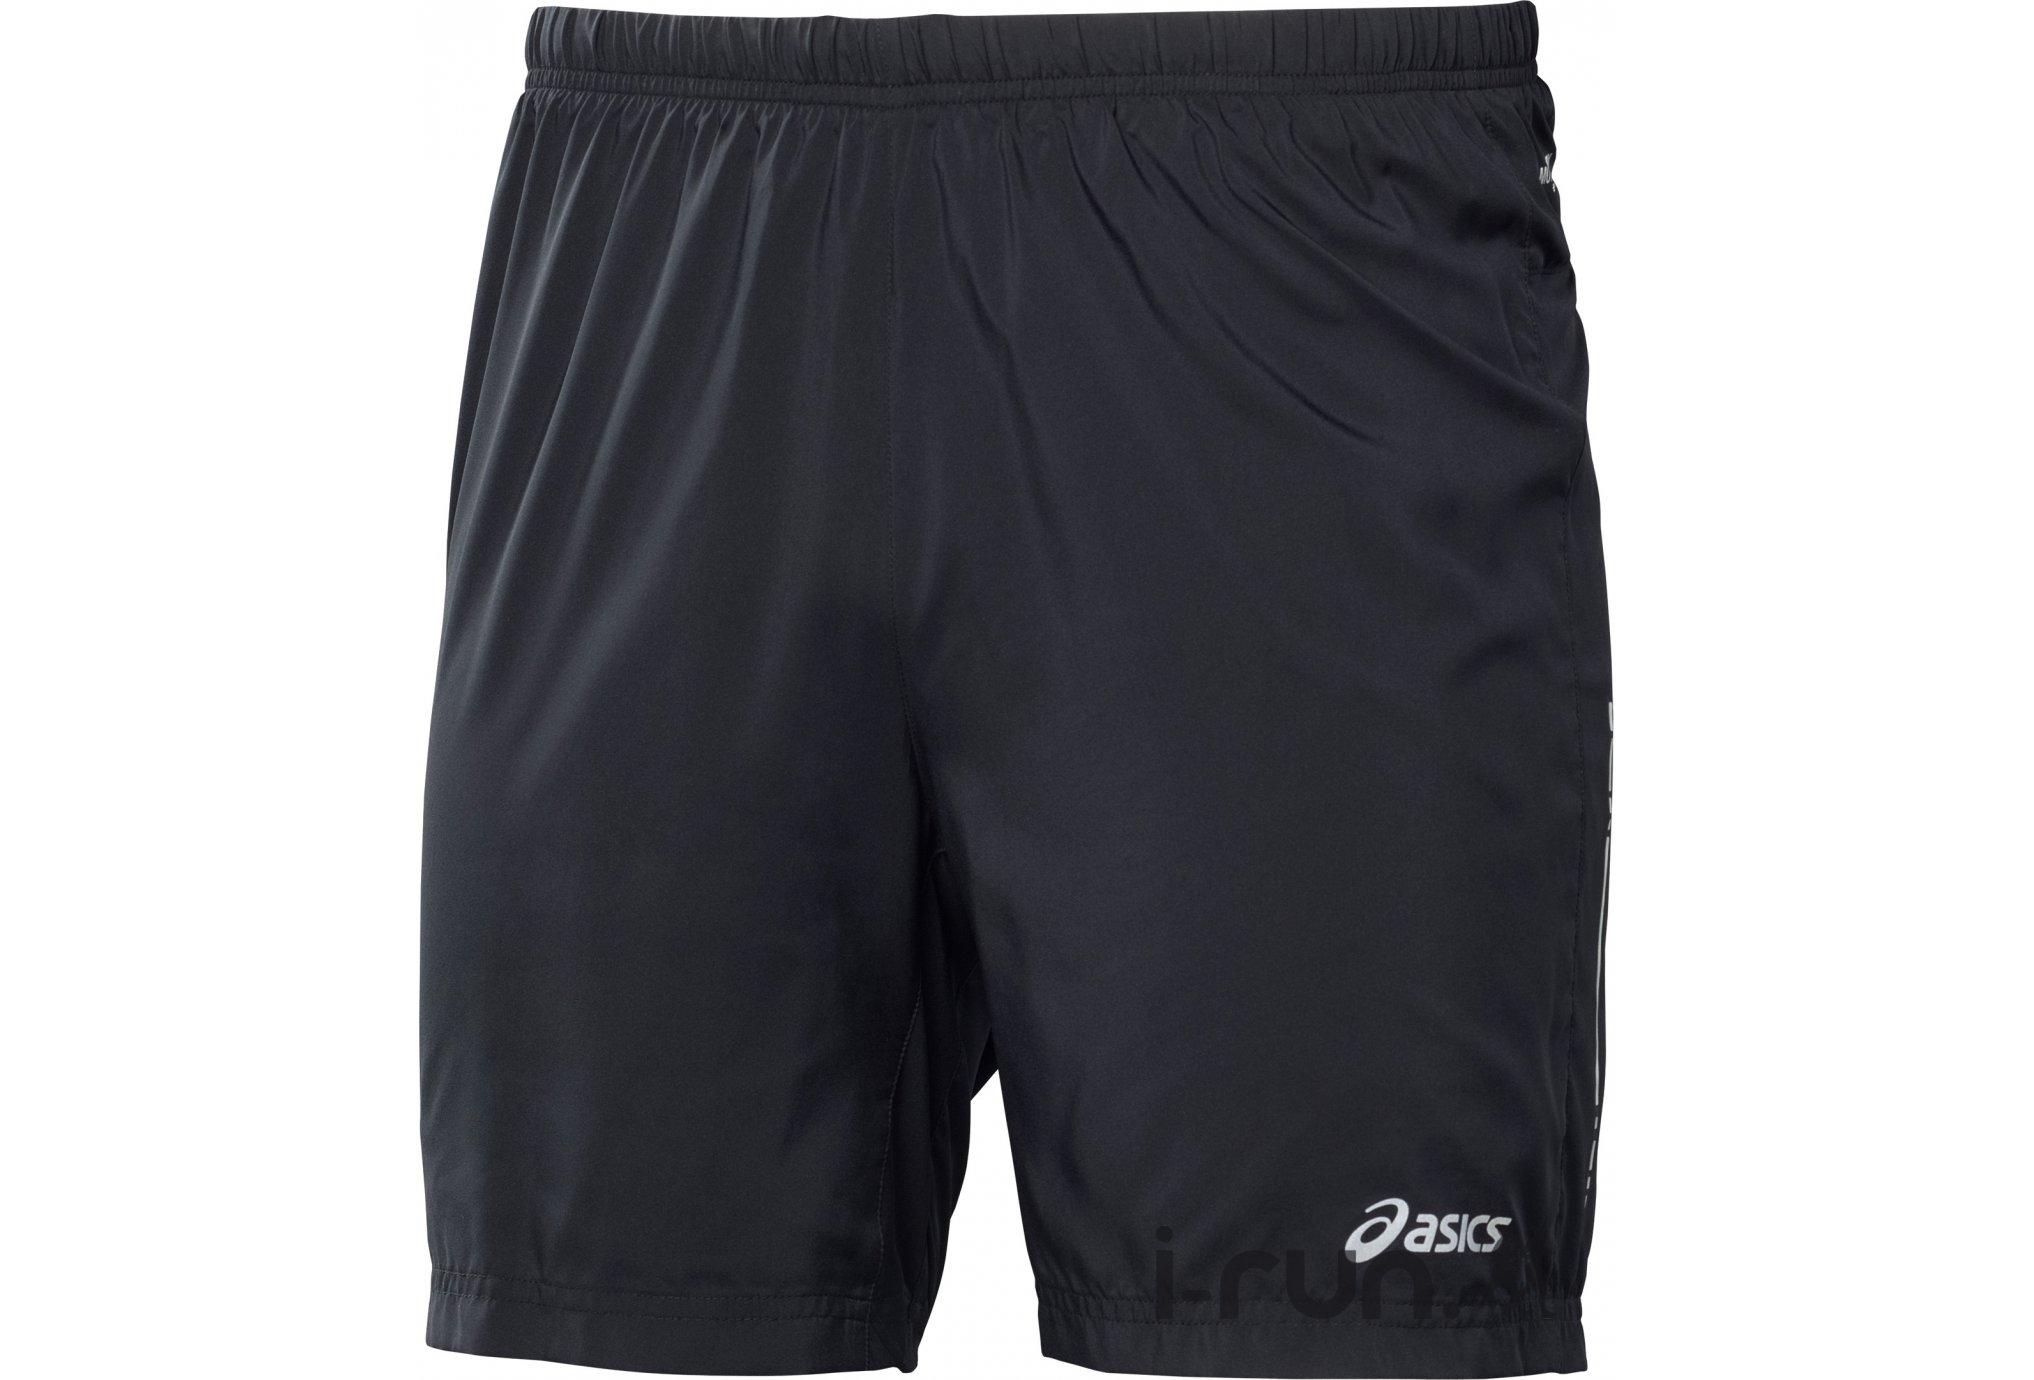 Asics Short Woven 2 en 1 M vêtement running homme